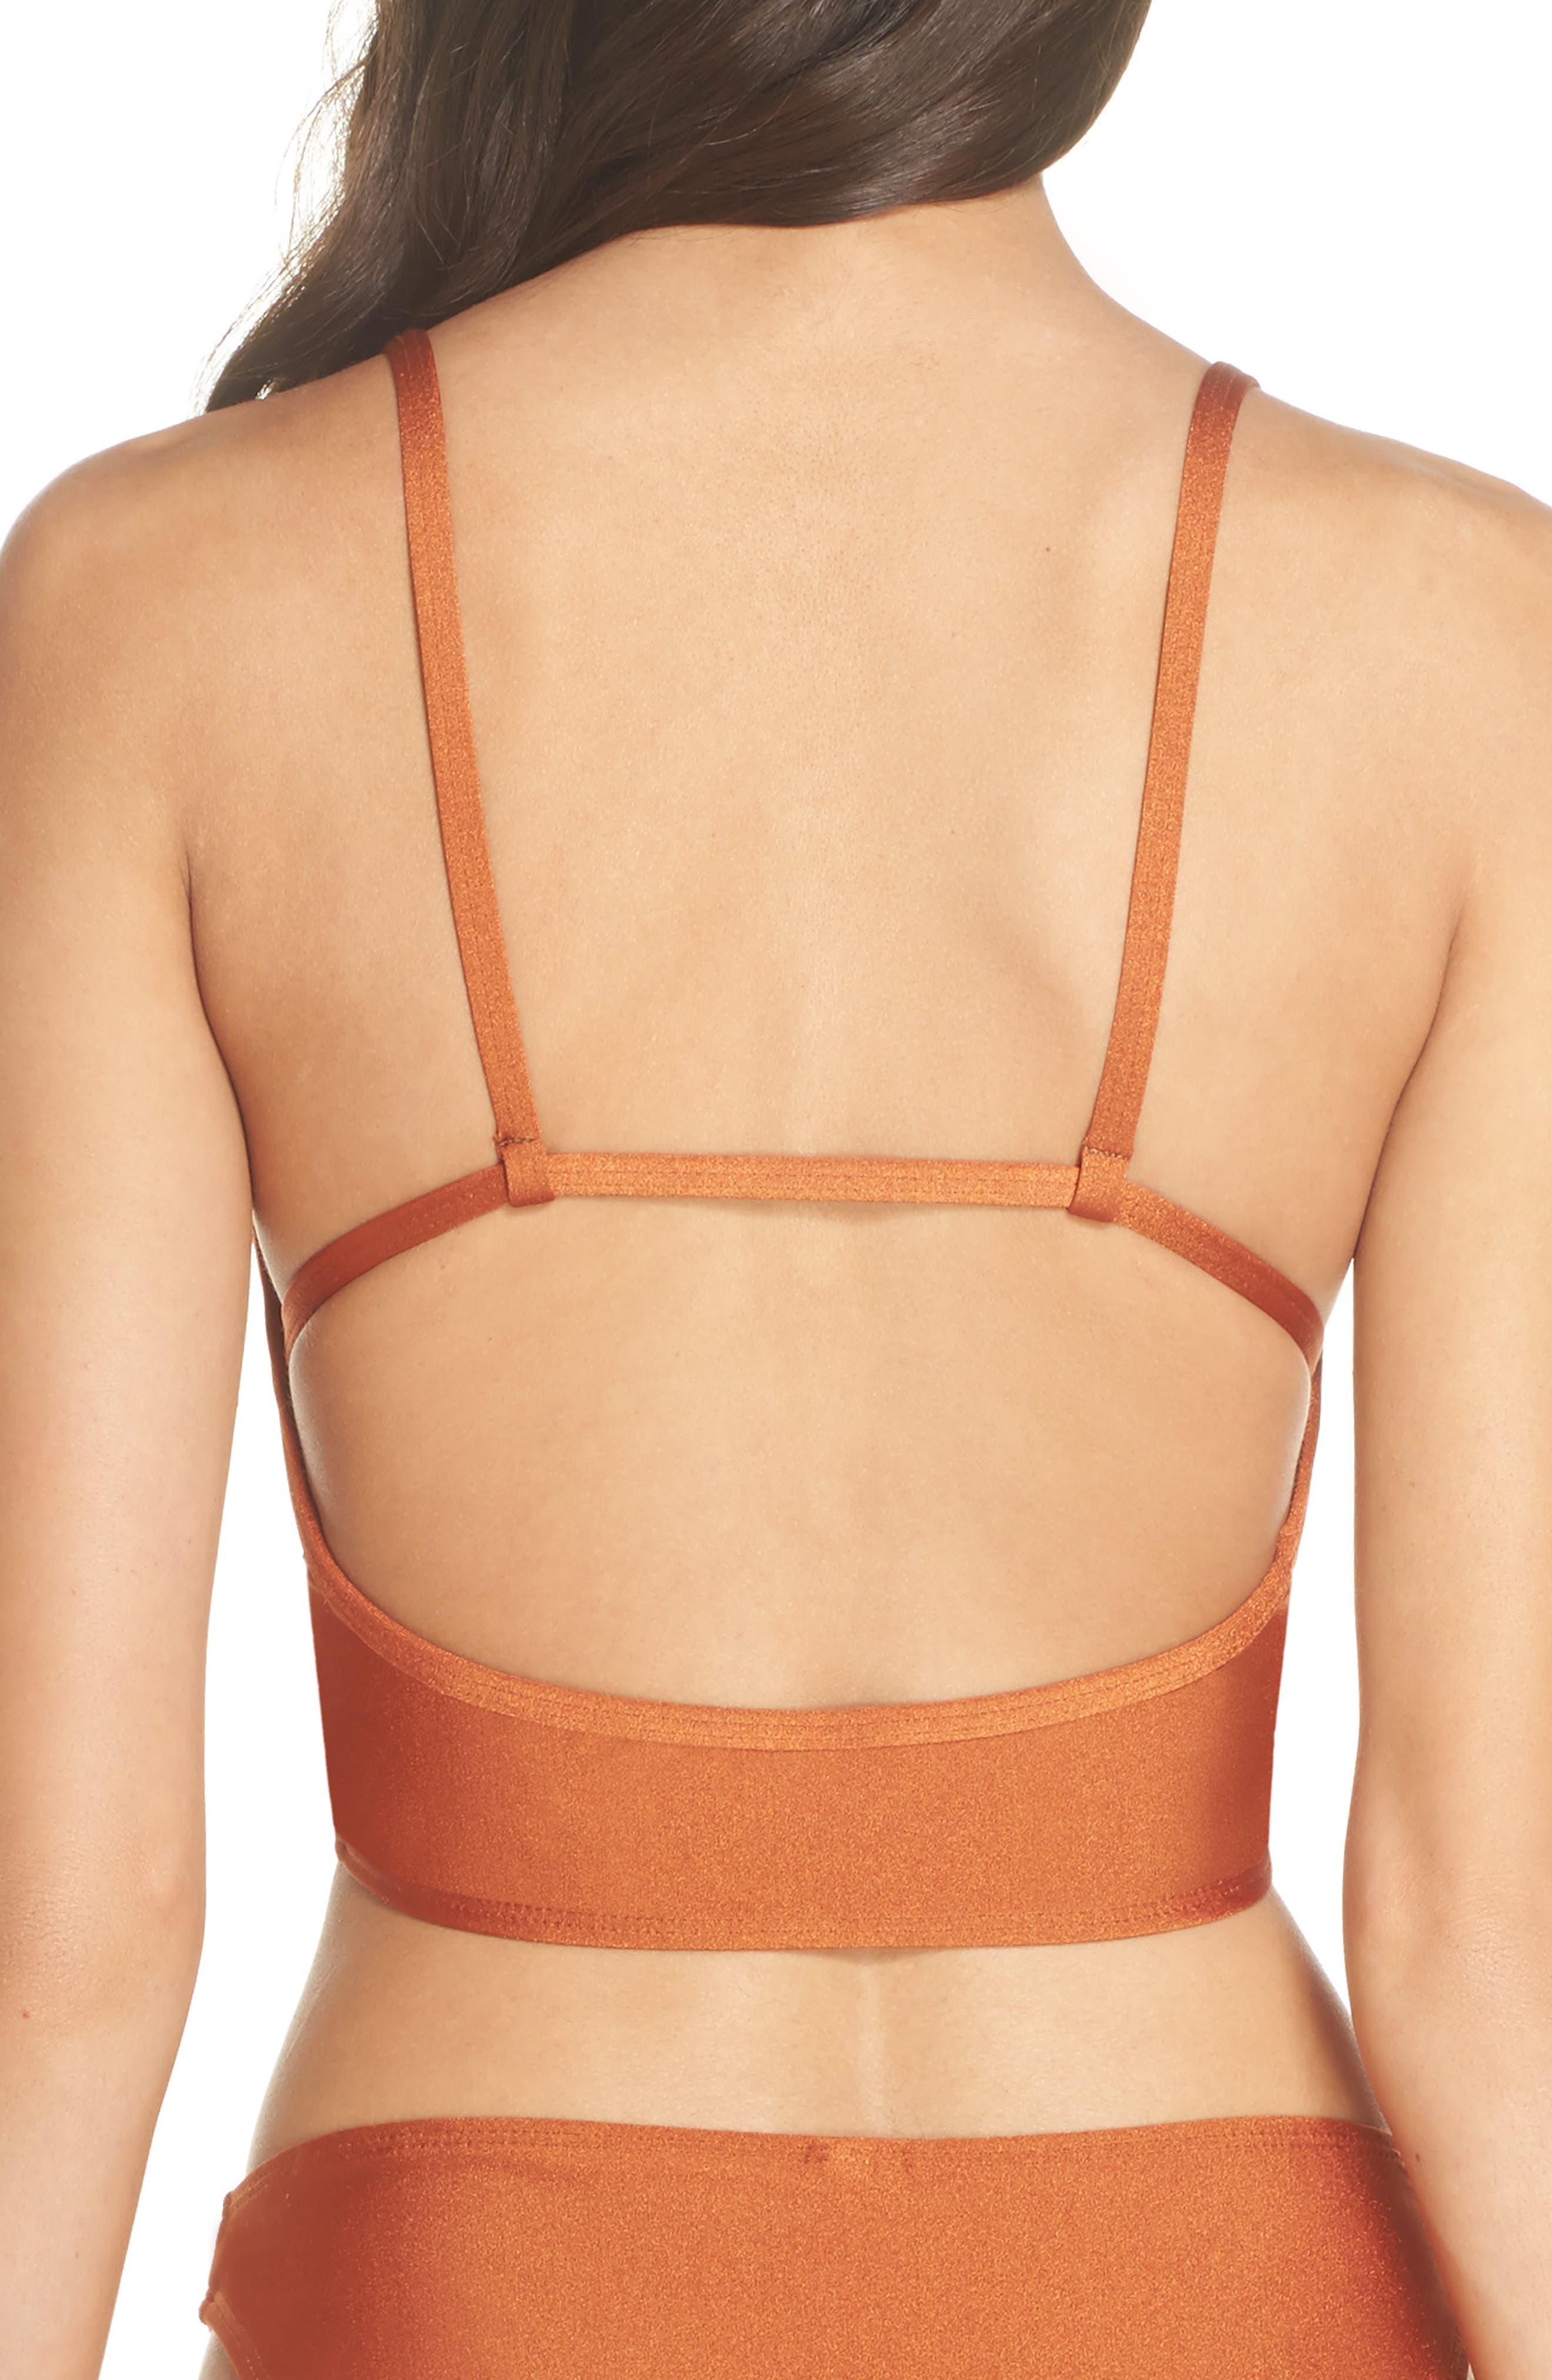 Horizon Bikini Top,                             Alternate thumbnail 2, color,                             Ginger Orange